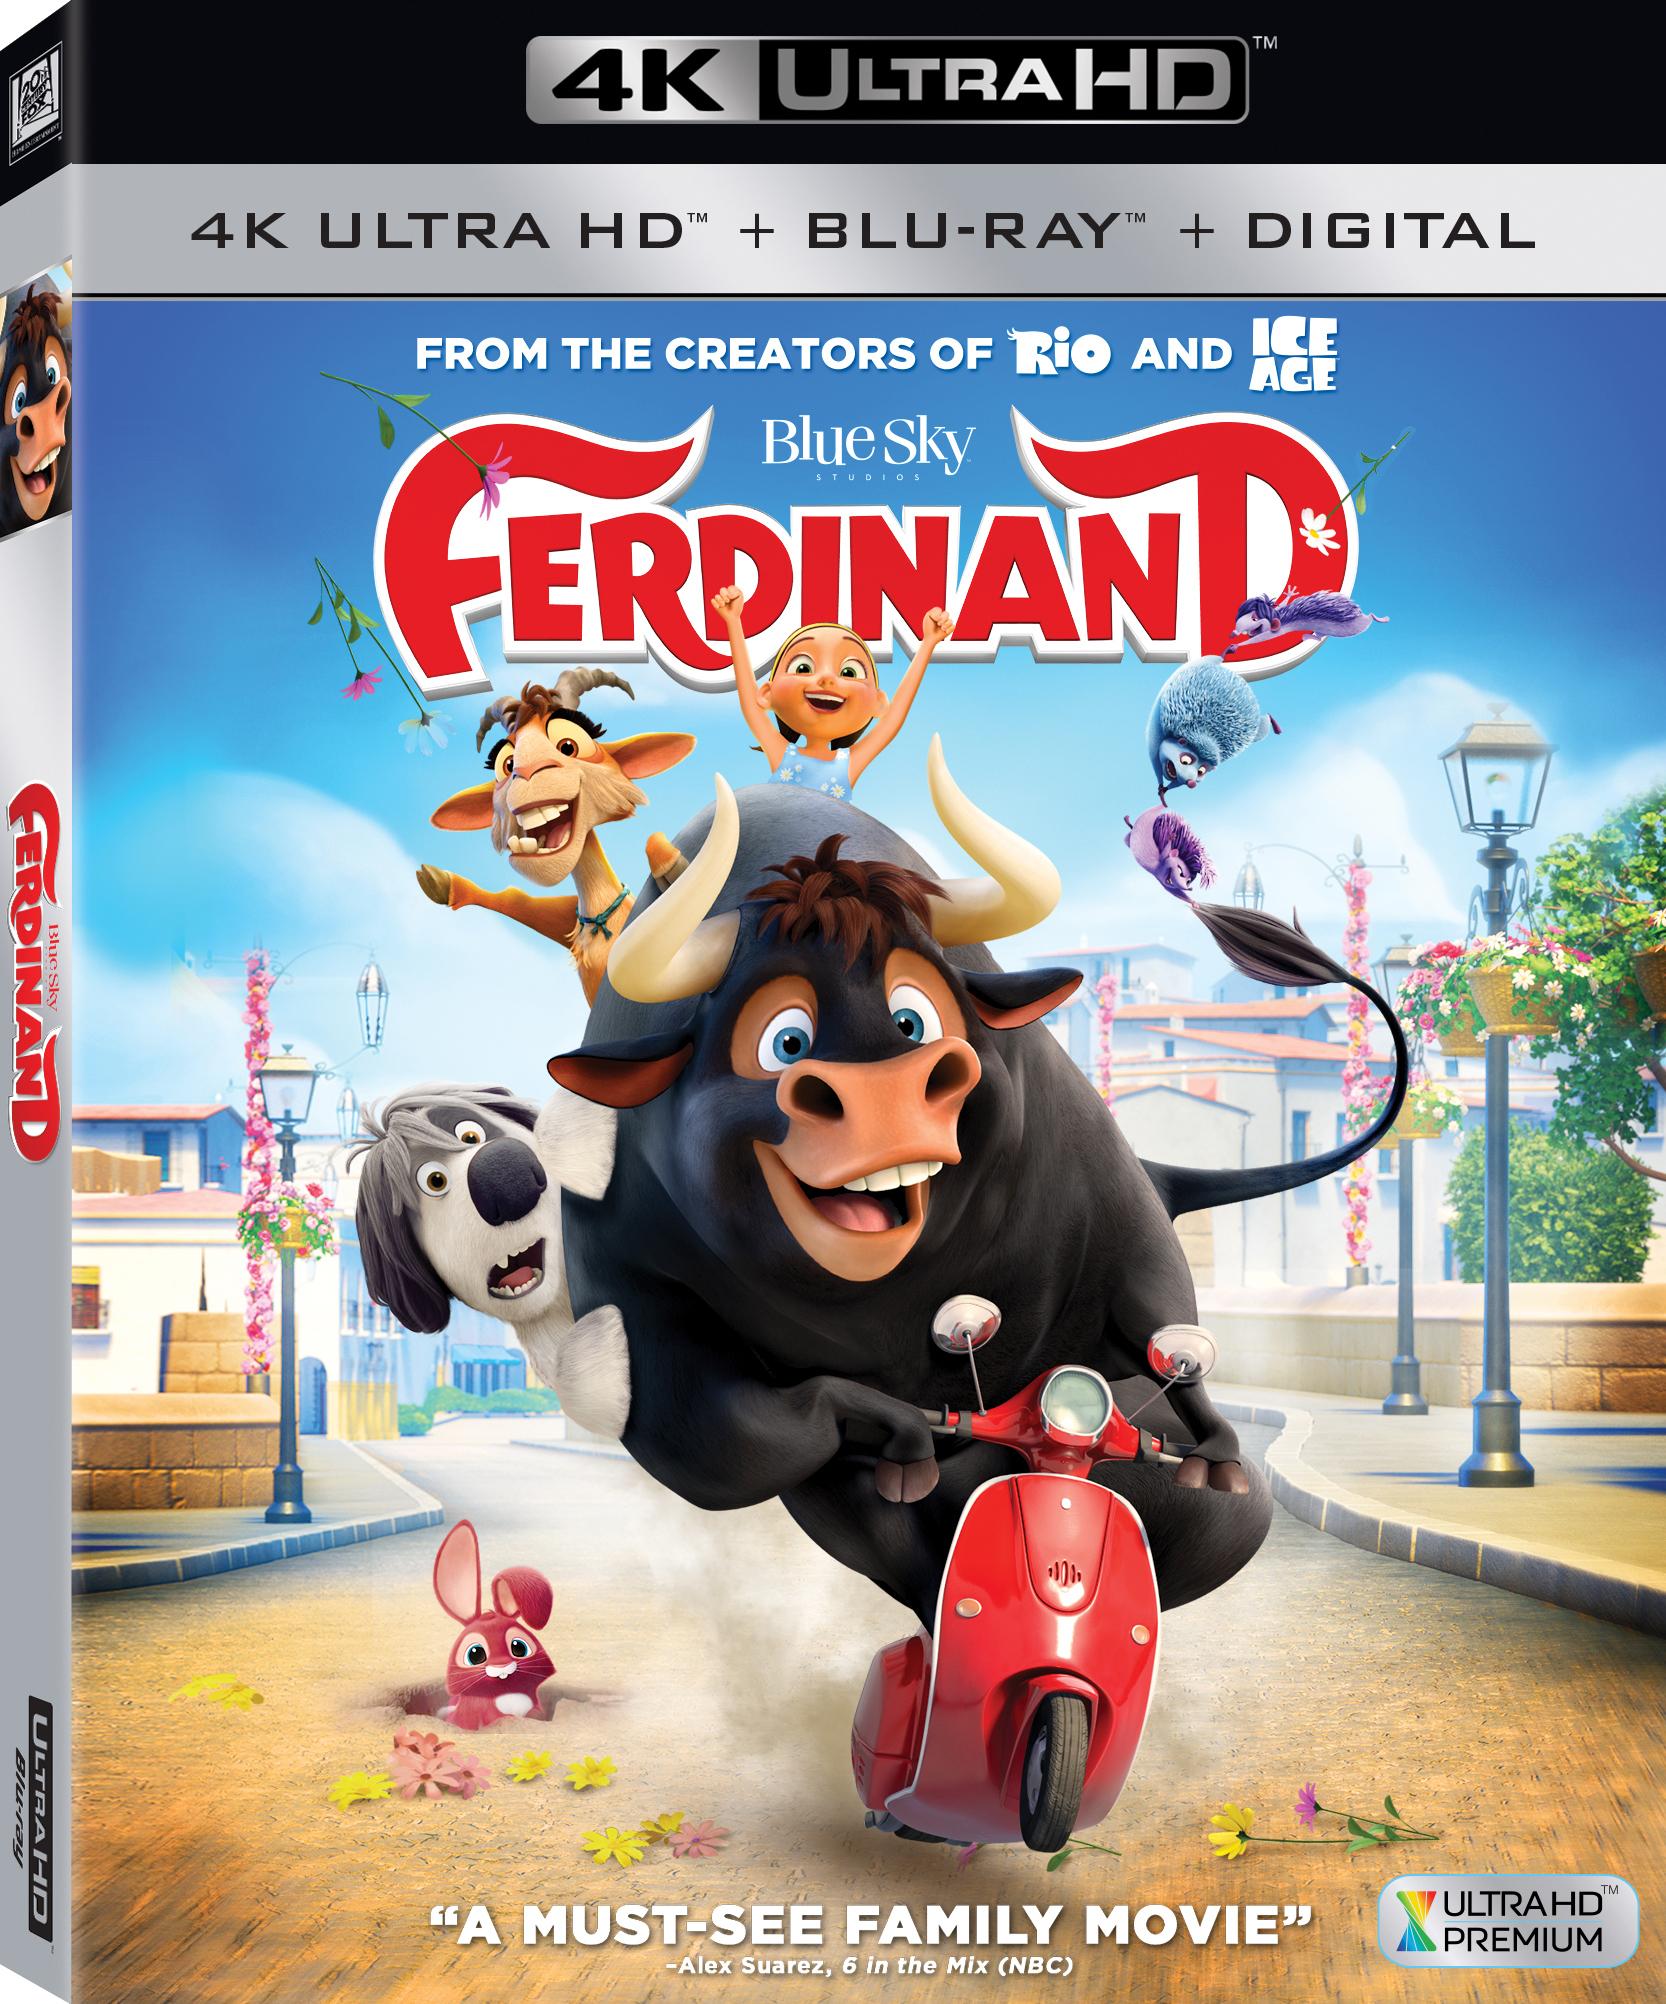 Ferdinand 4K (2017) 4K Ultra HD Blu-ray